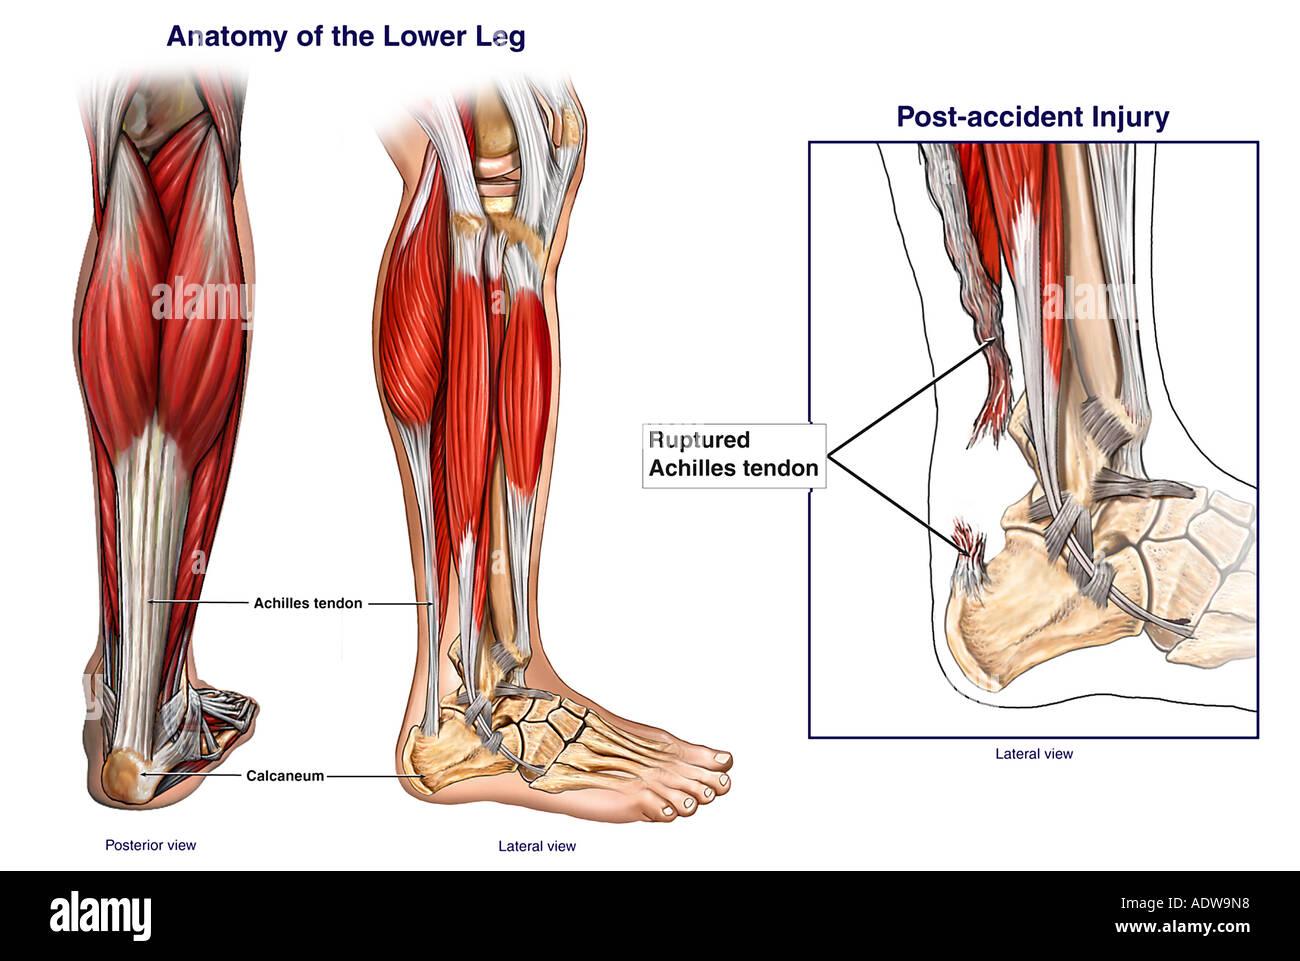 Normal Lower Legs Imágenes De Stock & Normal Lower Legs Fotos De ...